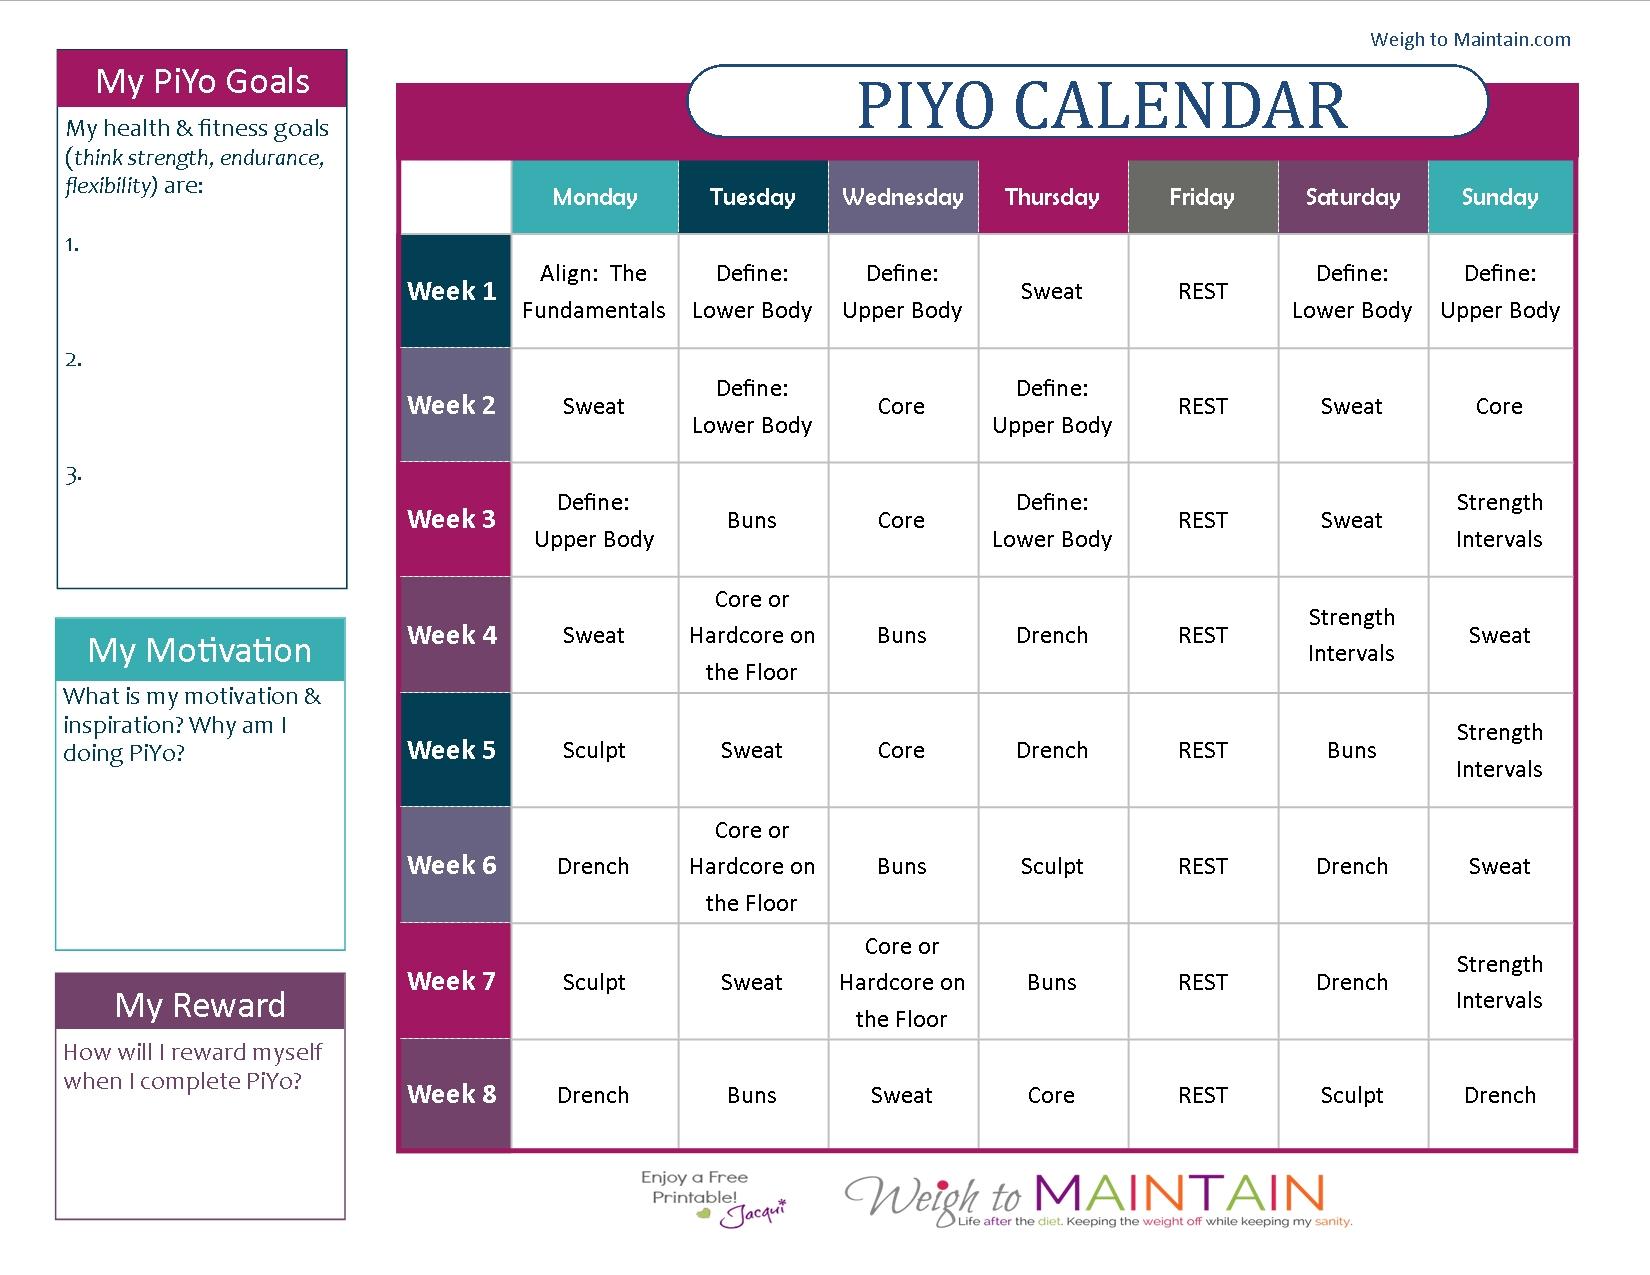 Piyo 8 Week Calendar | Ten Free Printable Calendar 20202021 pertaining to Piyo 21 Day Fix Hybrid Calendar